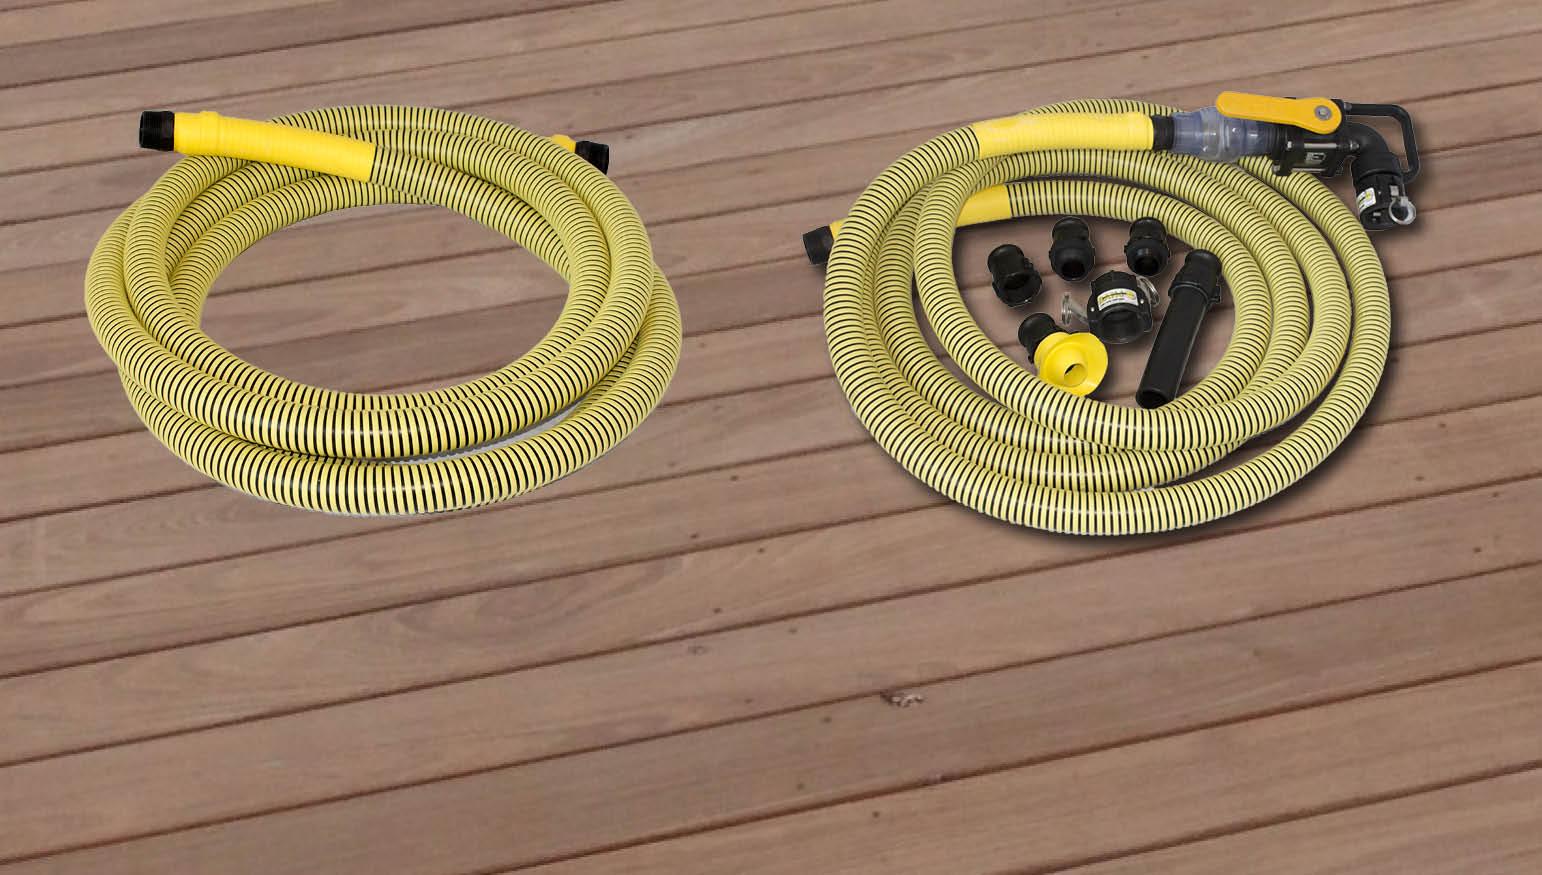 top-banner-acc-fittings-hosesfittingsacc-hoses-lg-.jpg